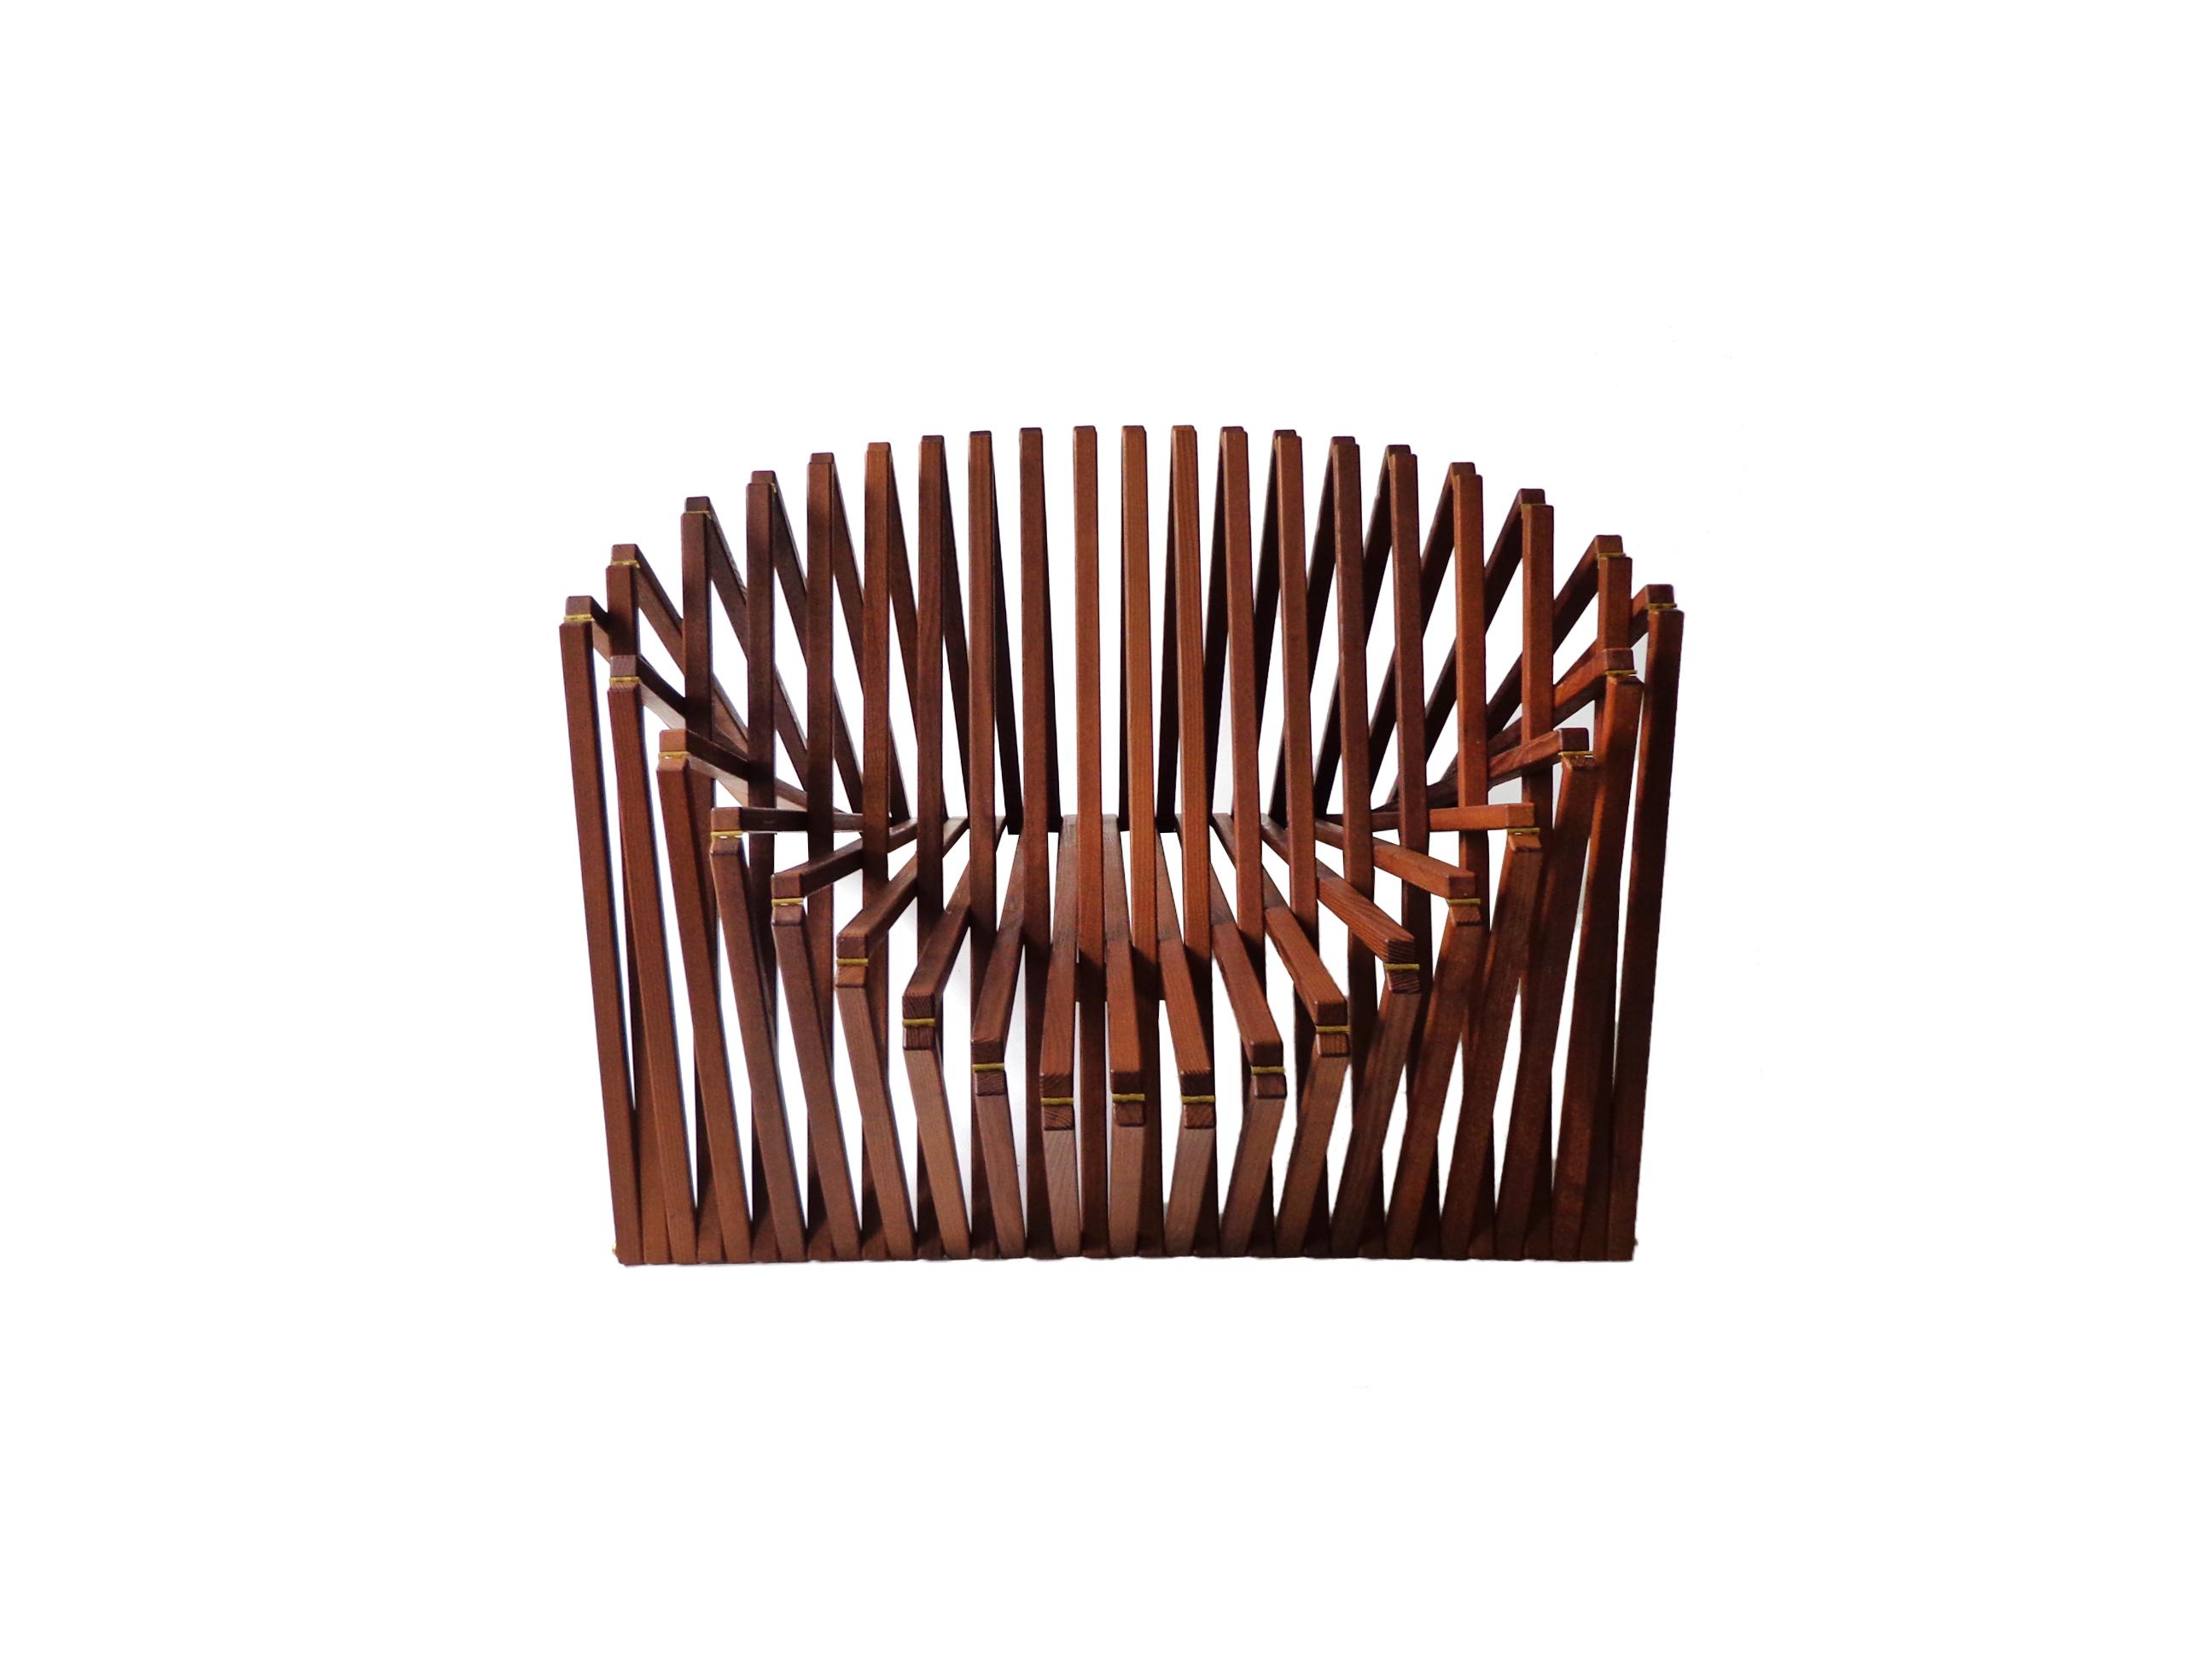 Robert van Embricqs, Rising Lounge armchair